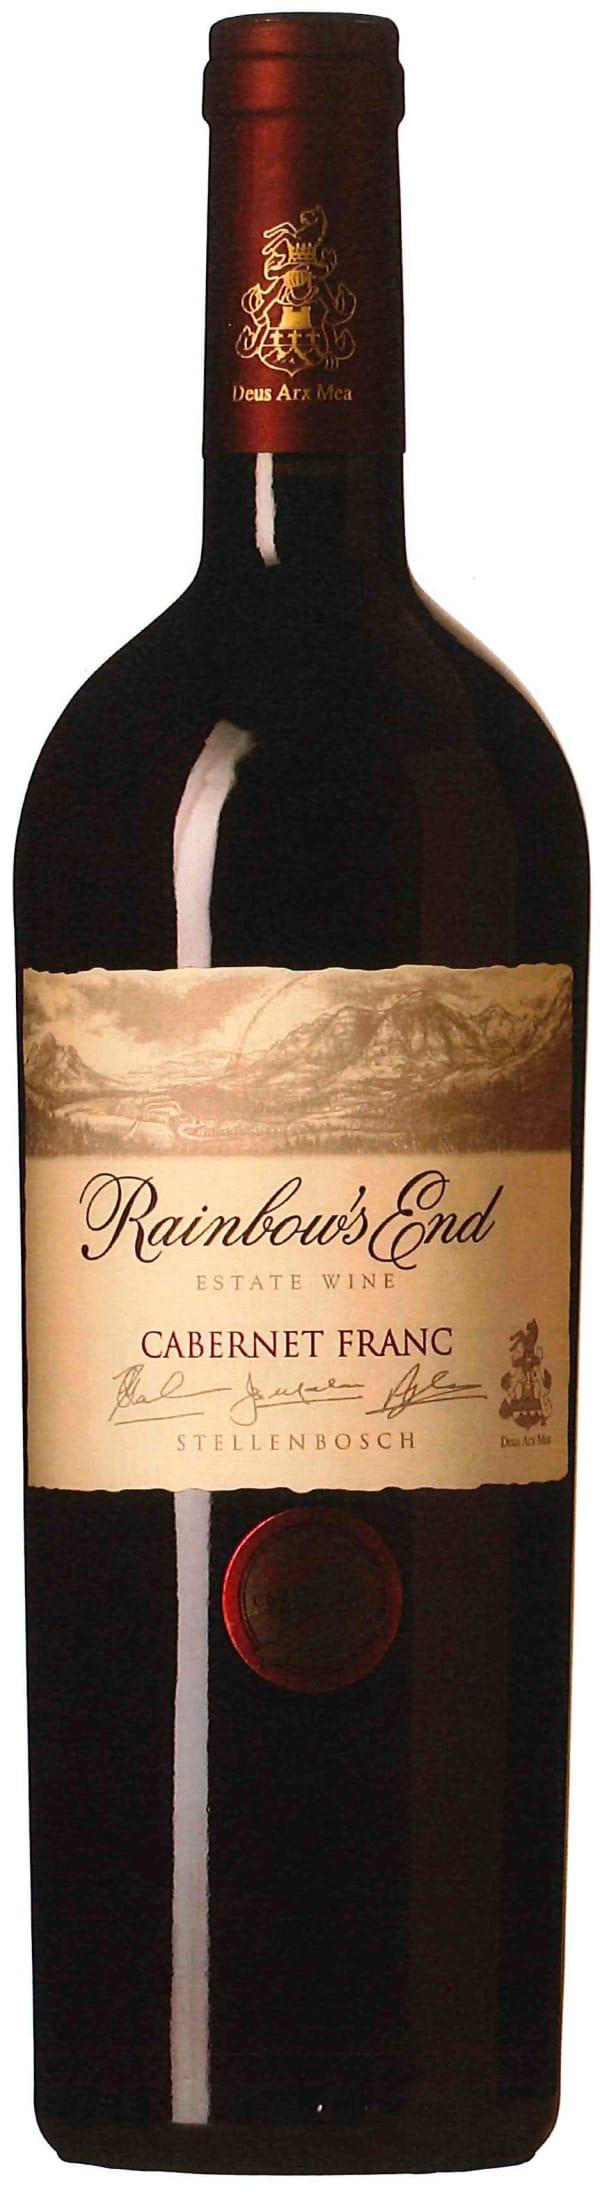 Rainbow's End Cabernet Franc 2015